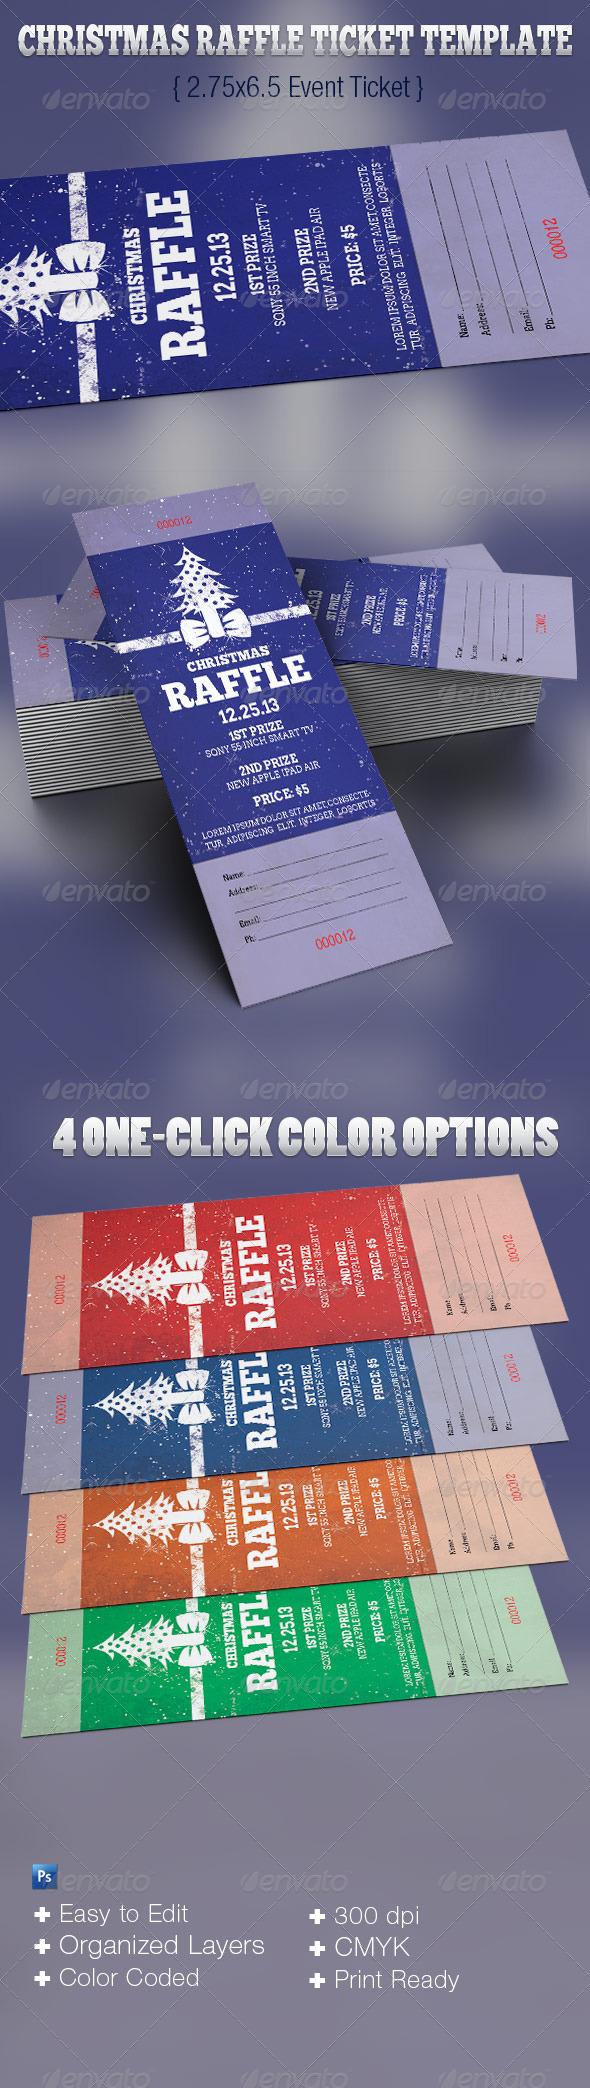 50 50 raffle tickets template - free printable 50 50 raffle flyer template